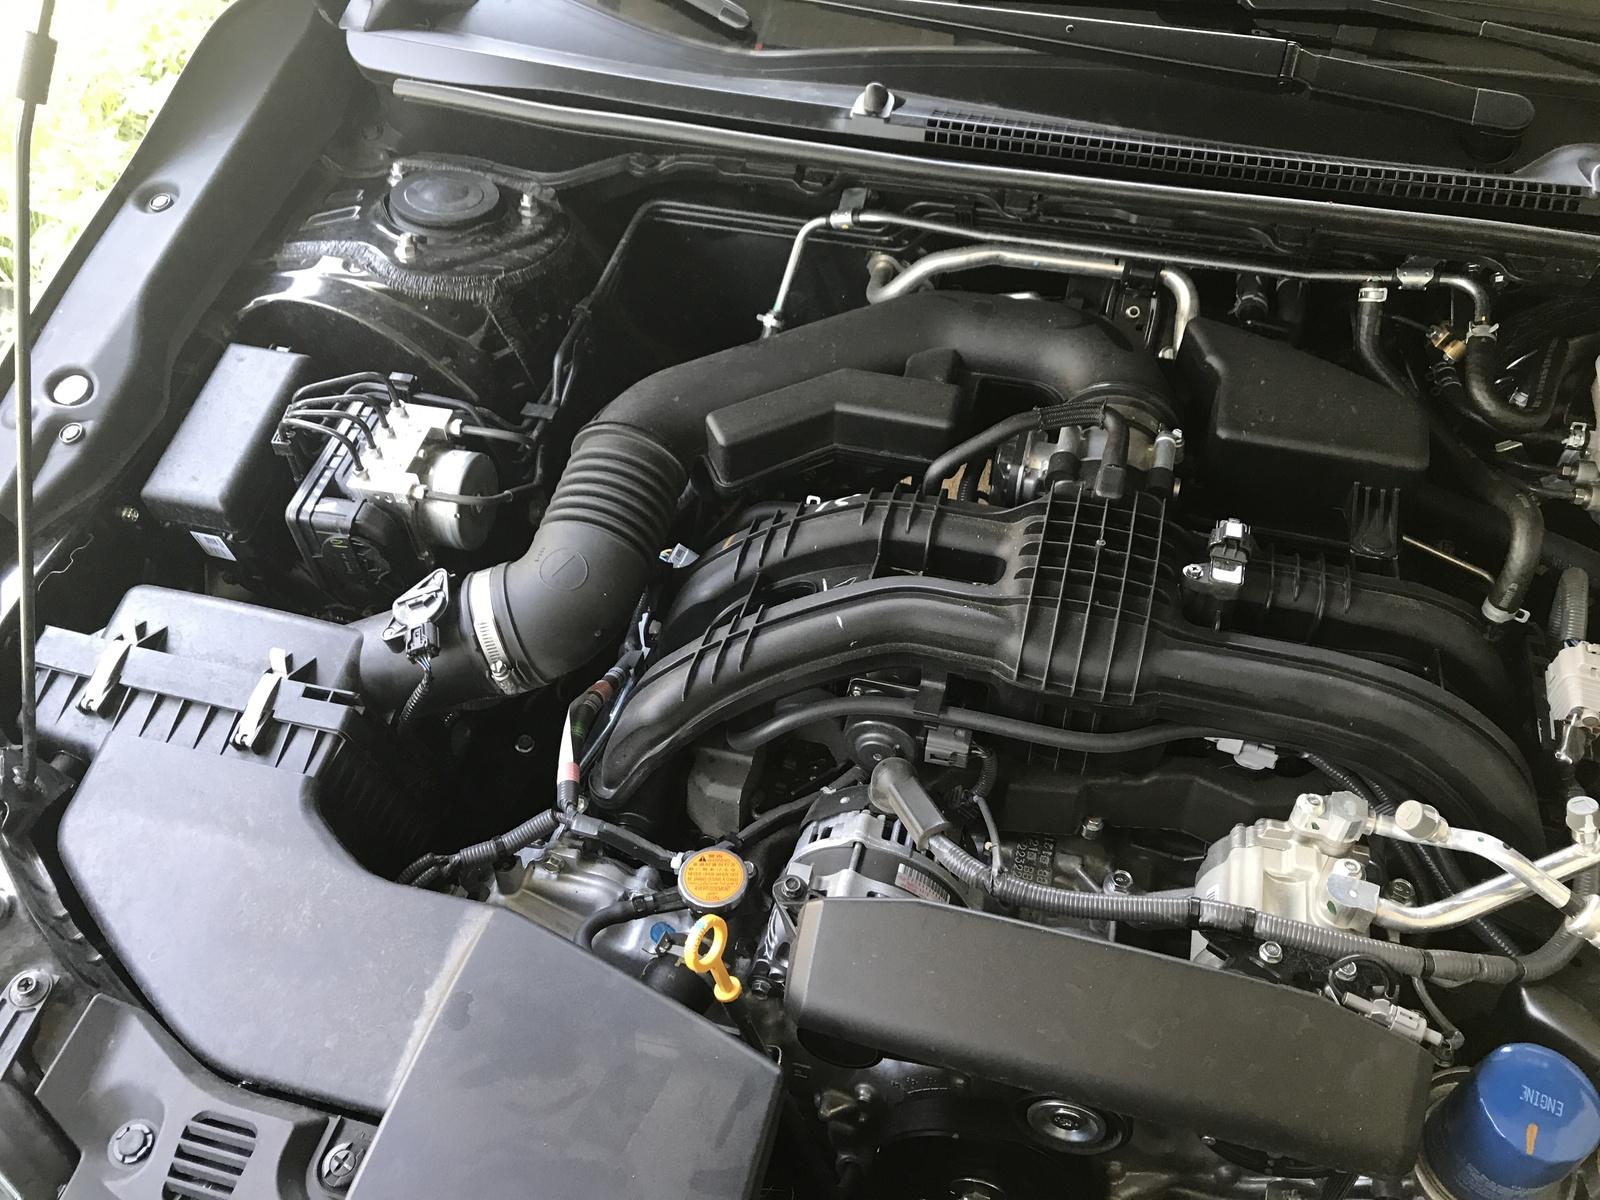 Subaru Impreza Questions Air intake CarGurus